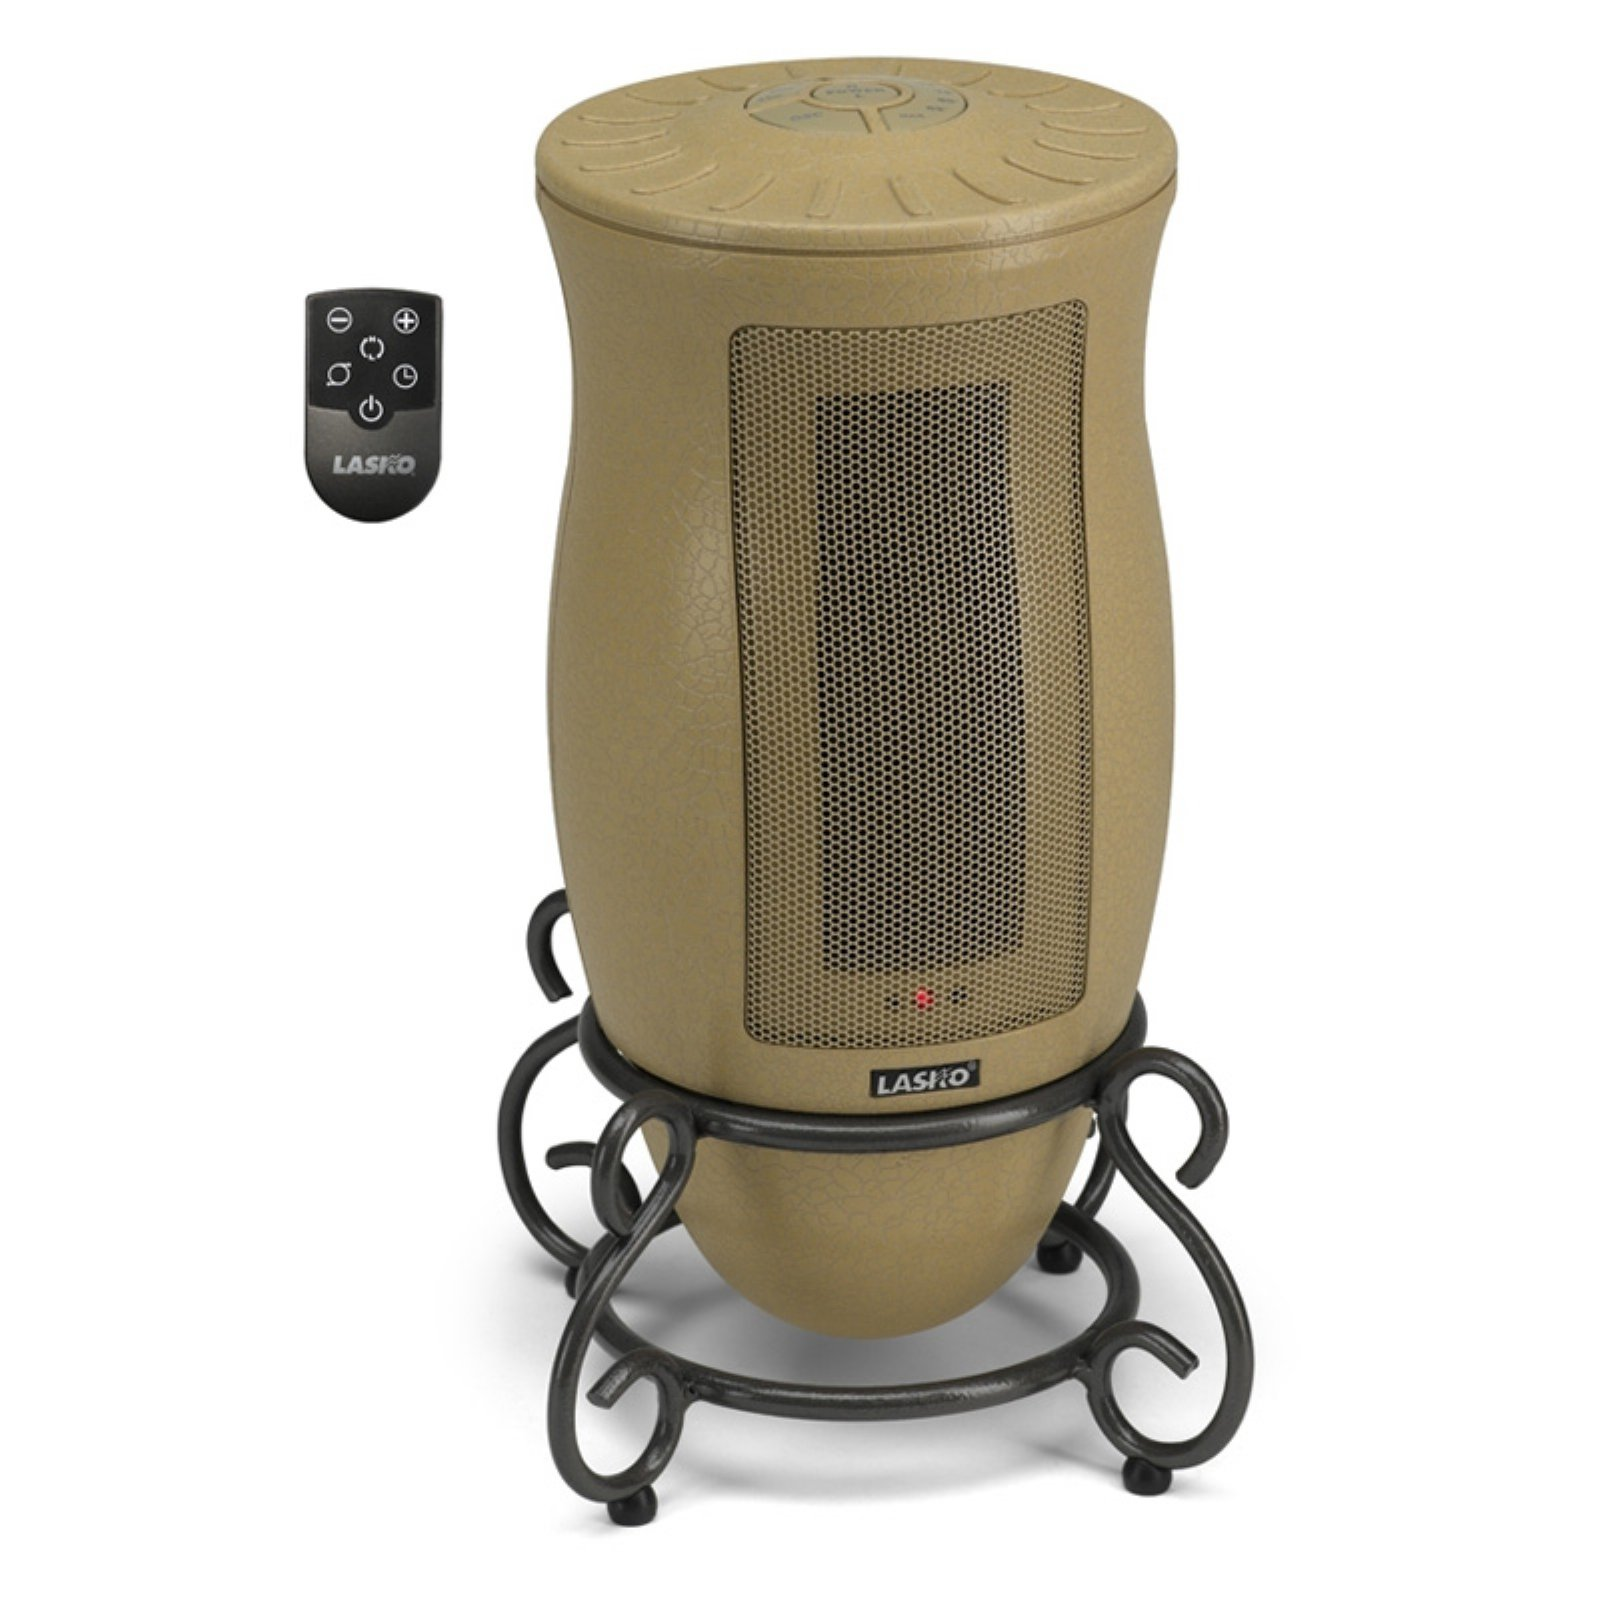 Lasko Designer Series Oscillating Ceramic Heater with Remote Control by Lasko